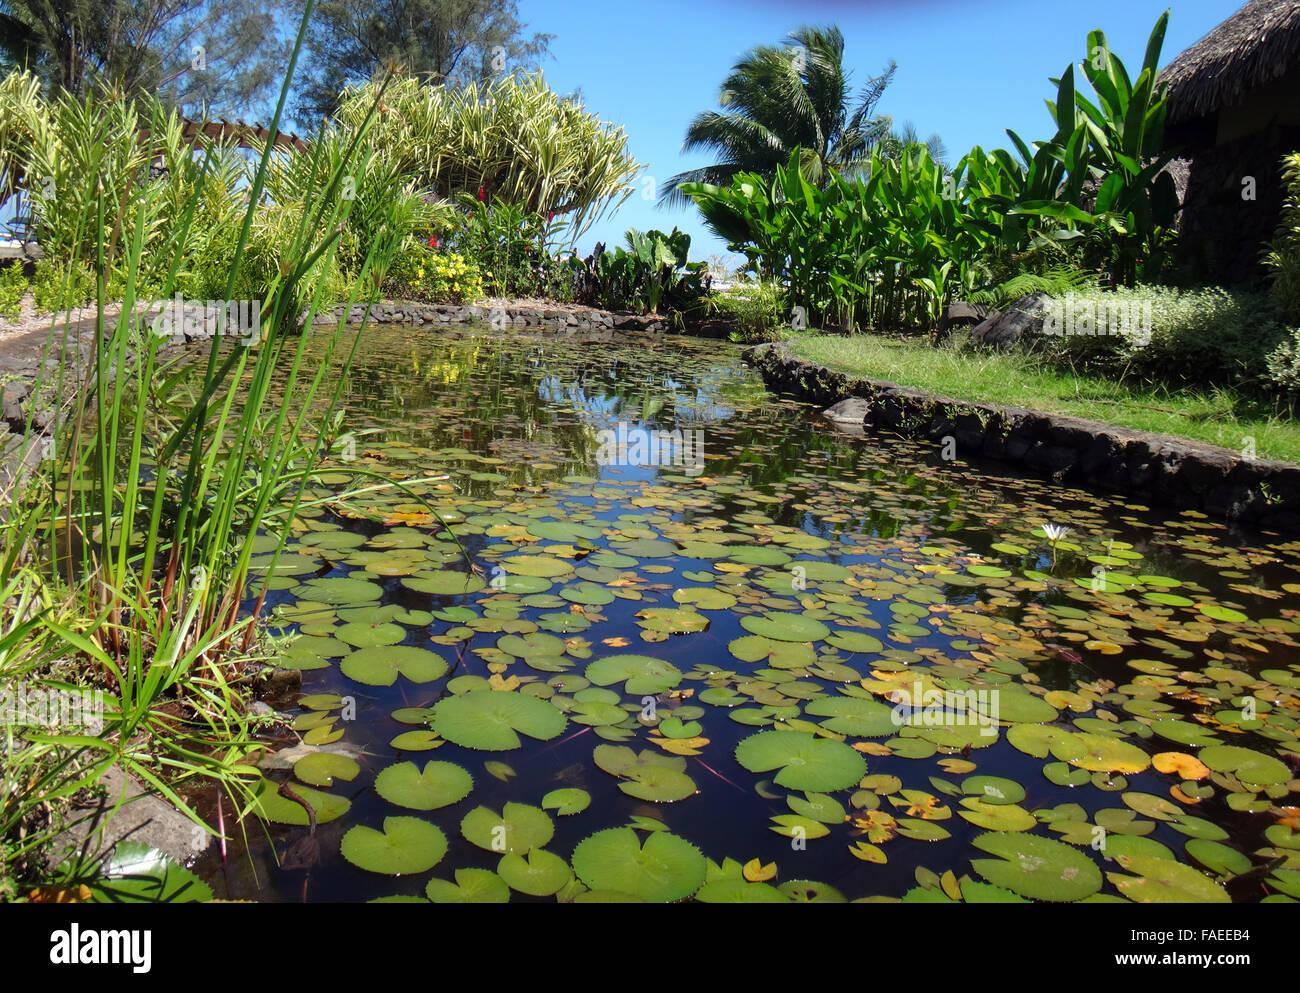 Ornamental fish pond of jardins de pa 39 ofa 39 i garden of for Ornamental pond fish